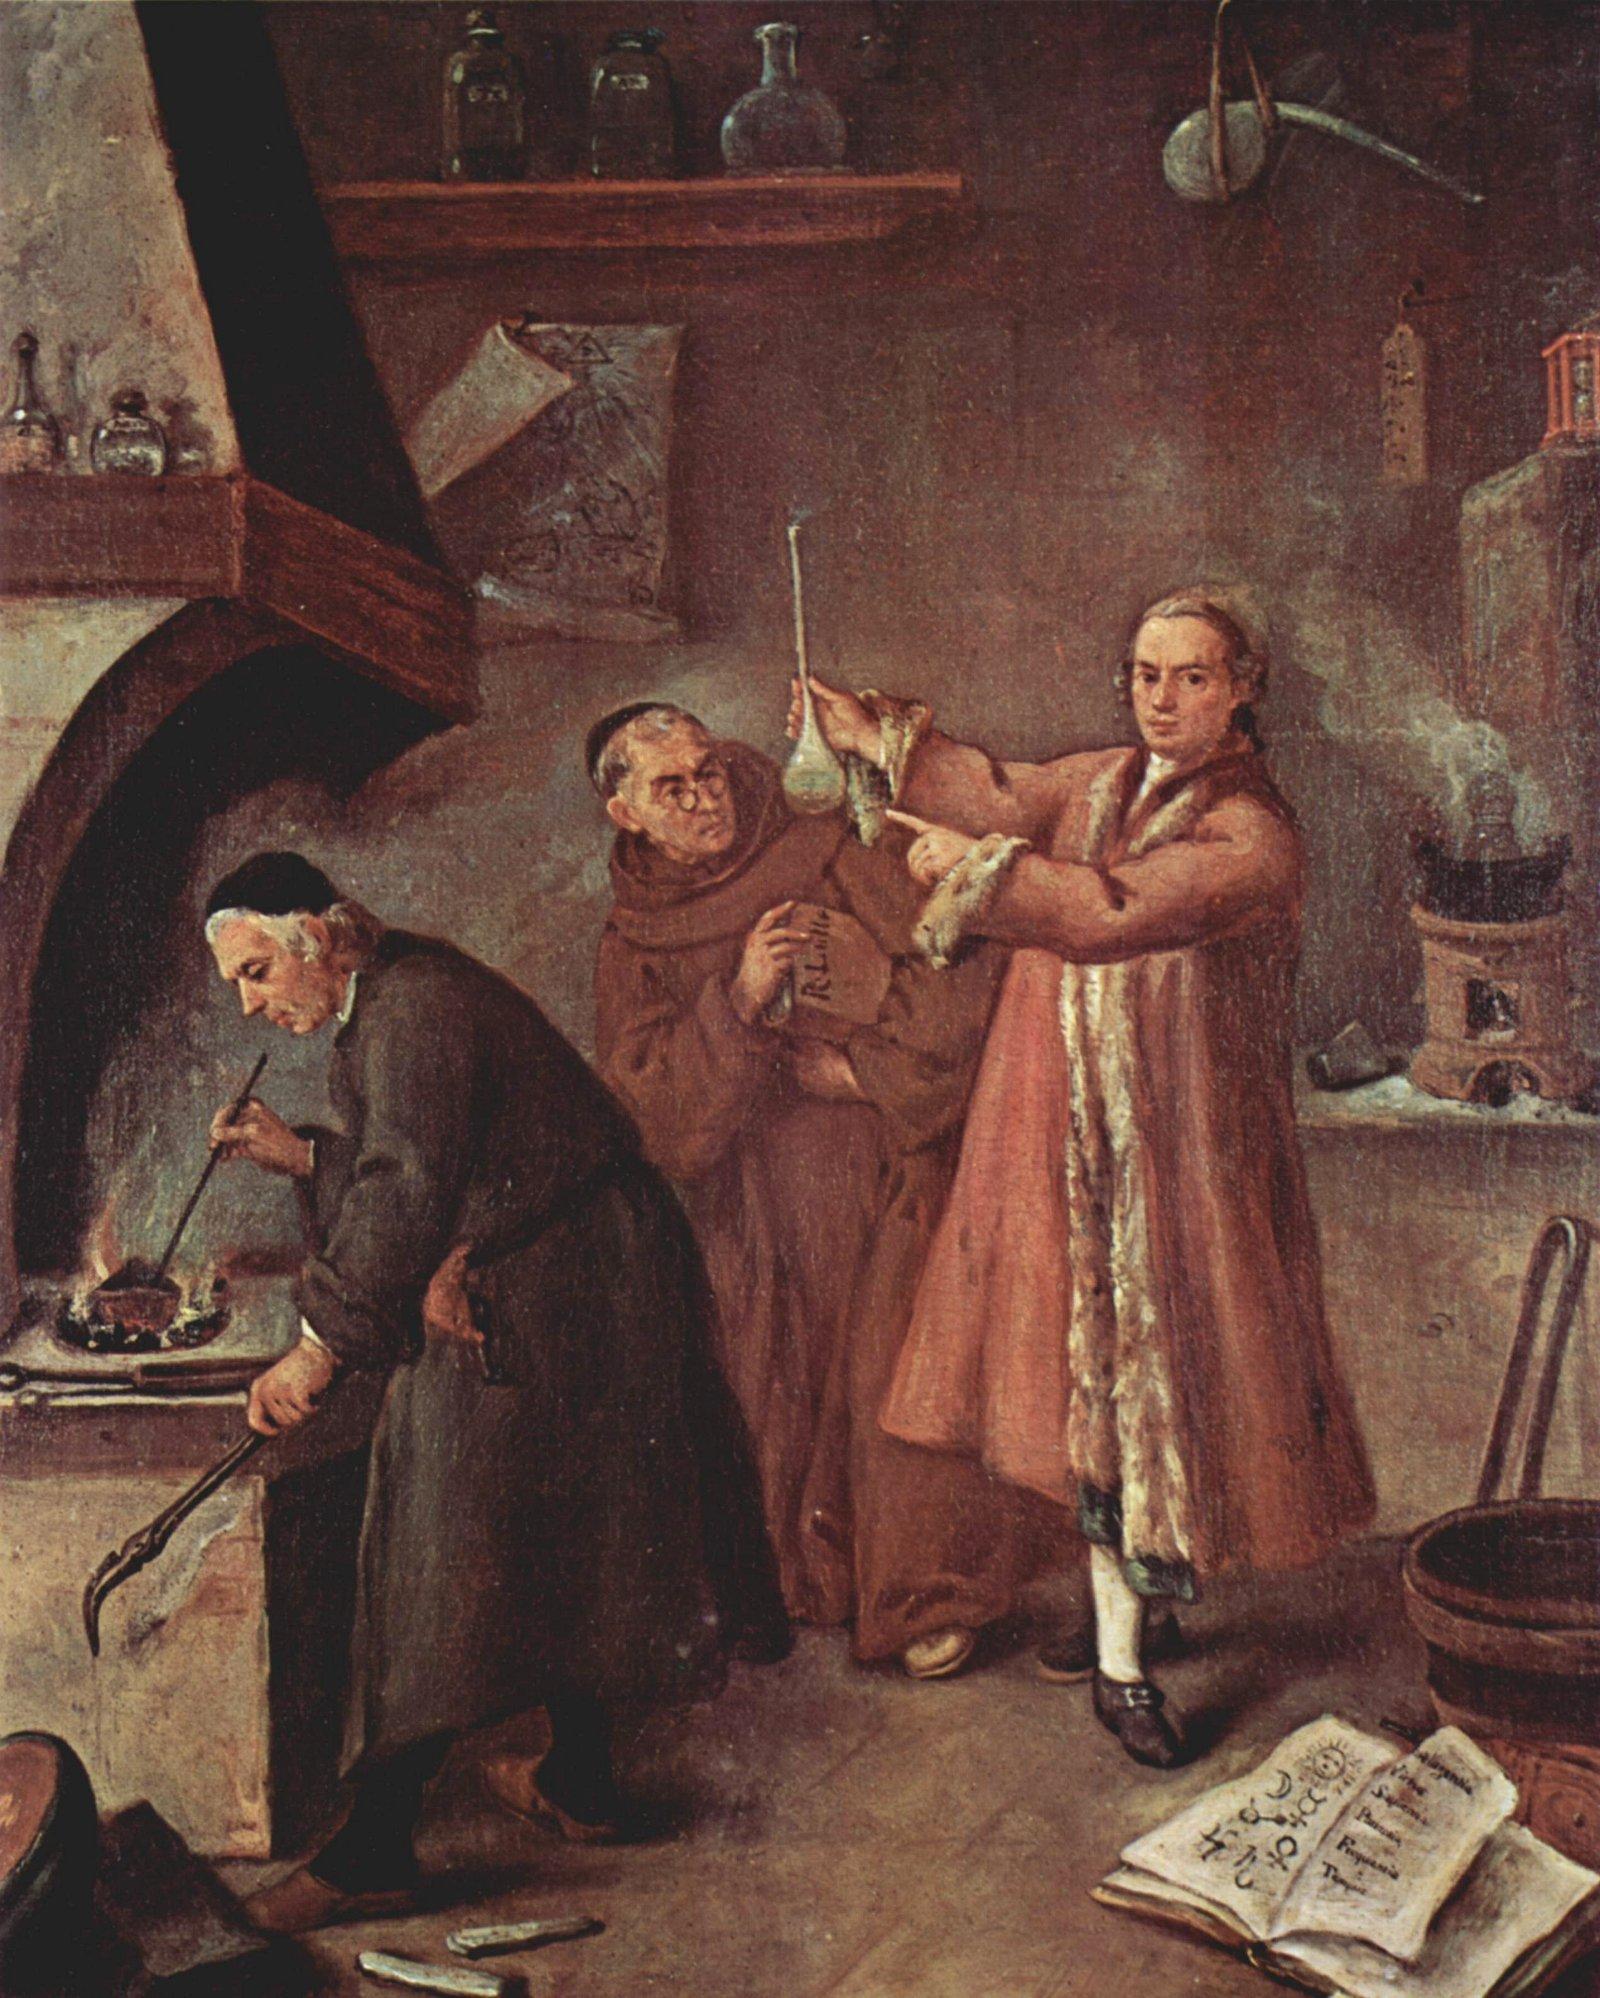 1757 Alchemist's lab by Pietro Longhi